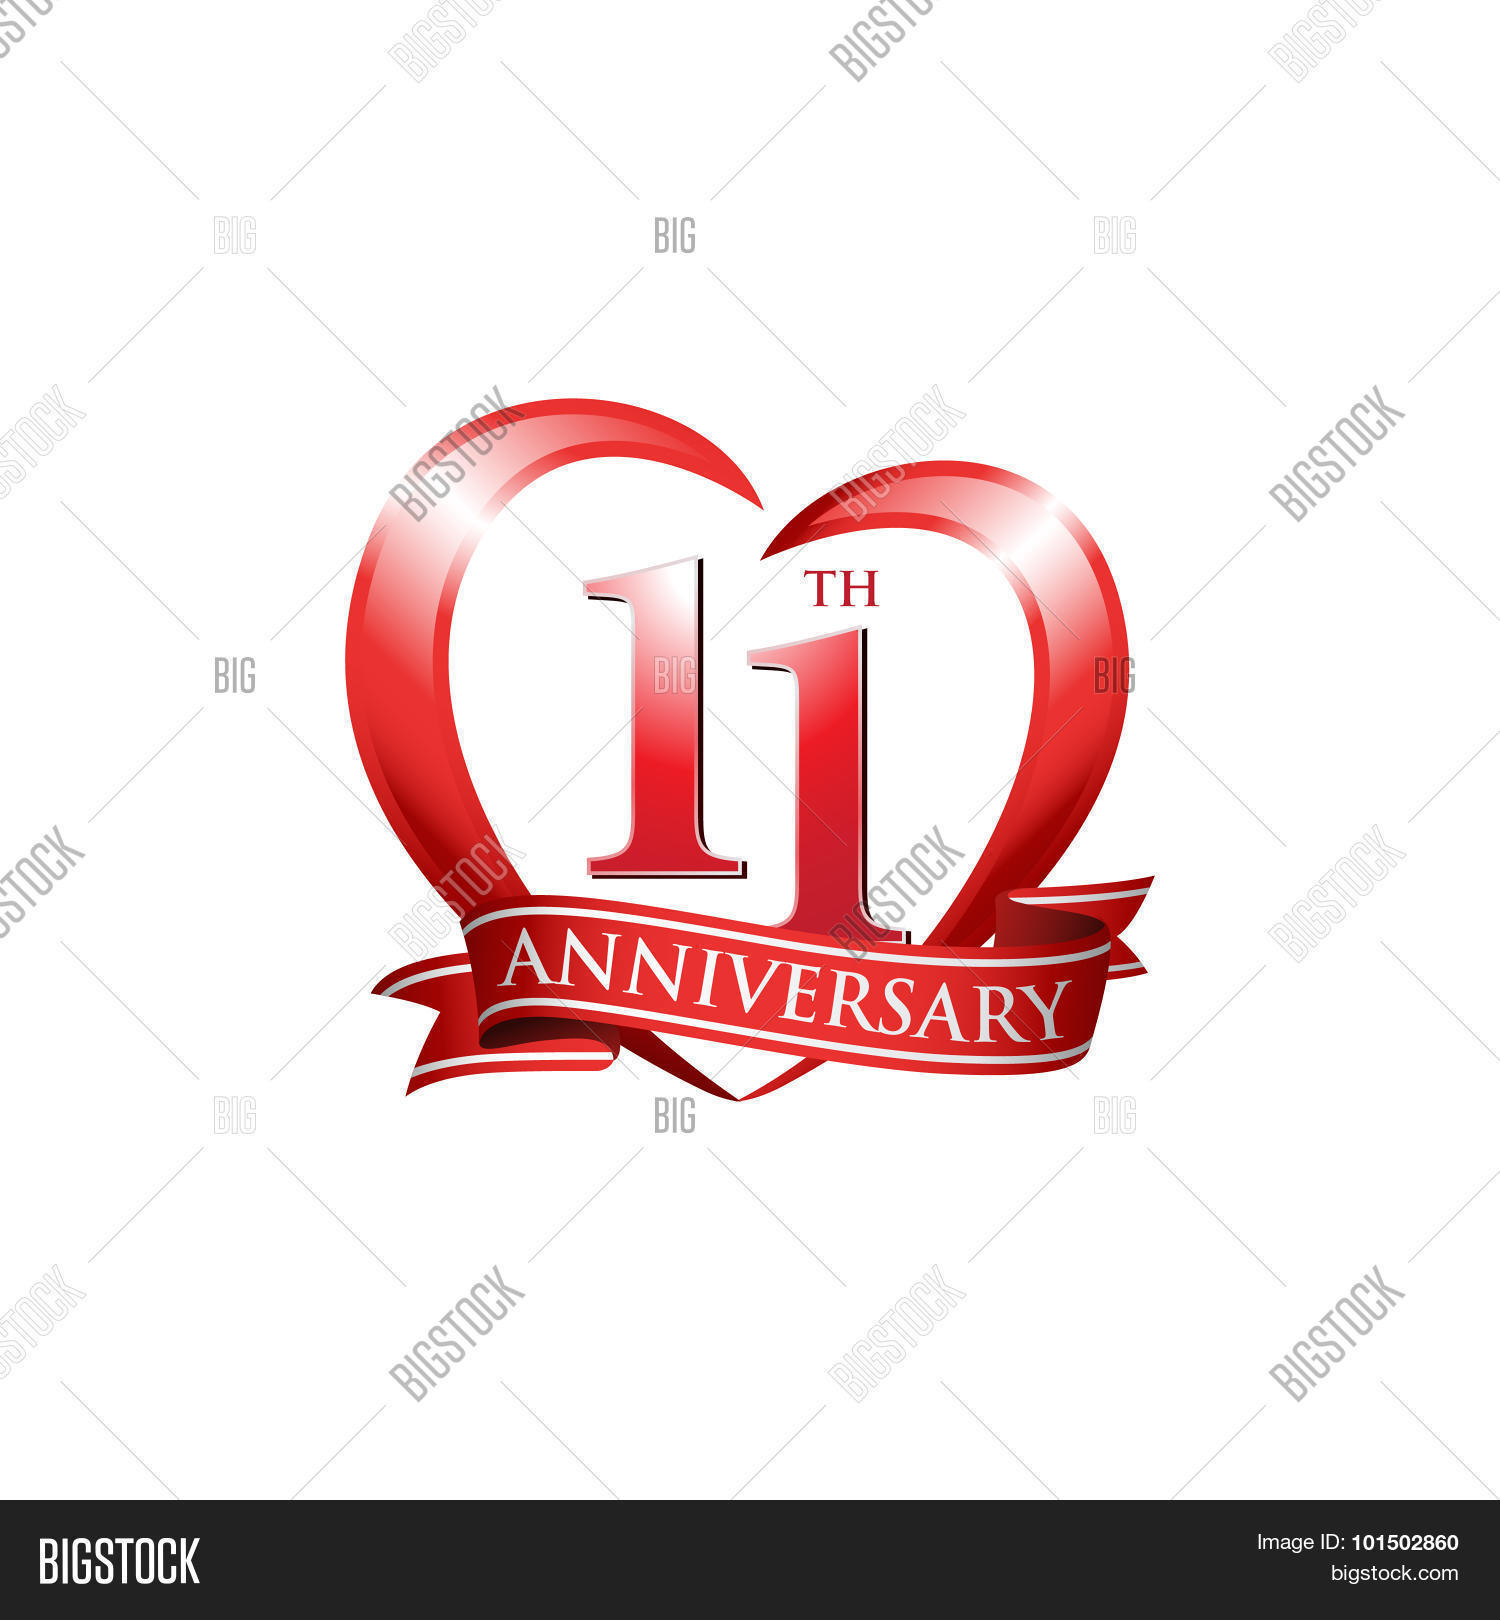 11th anniversary logo vector photo free trial bigstock